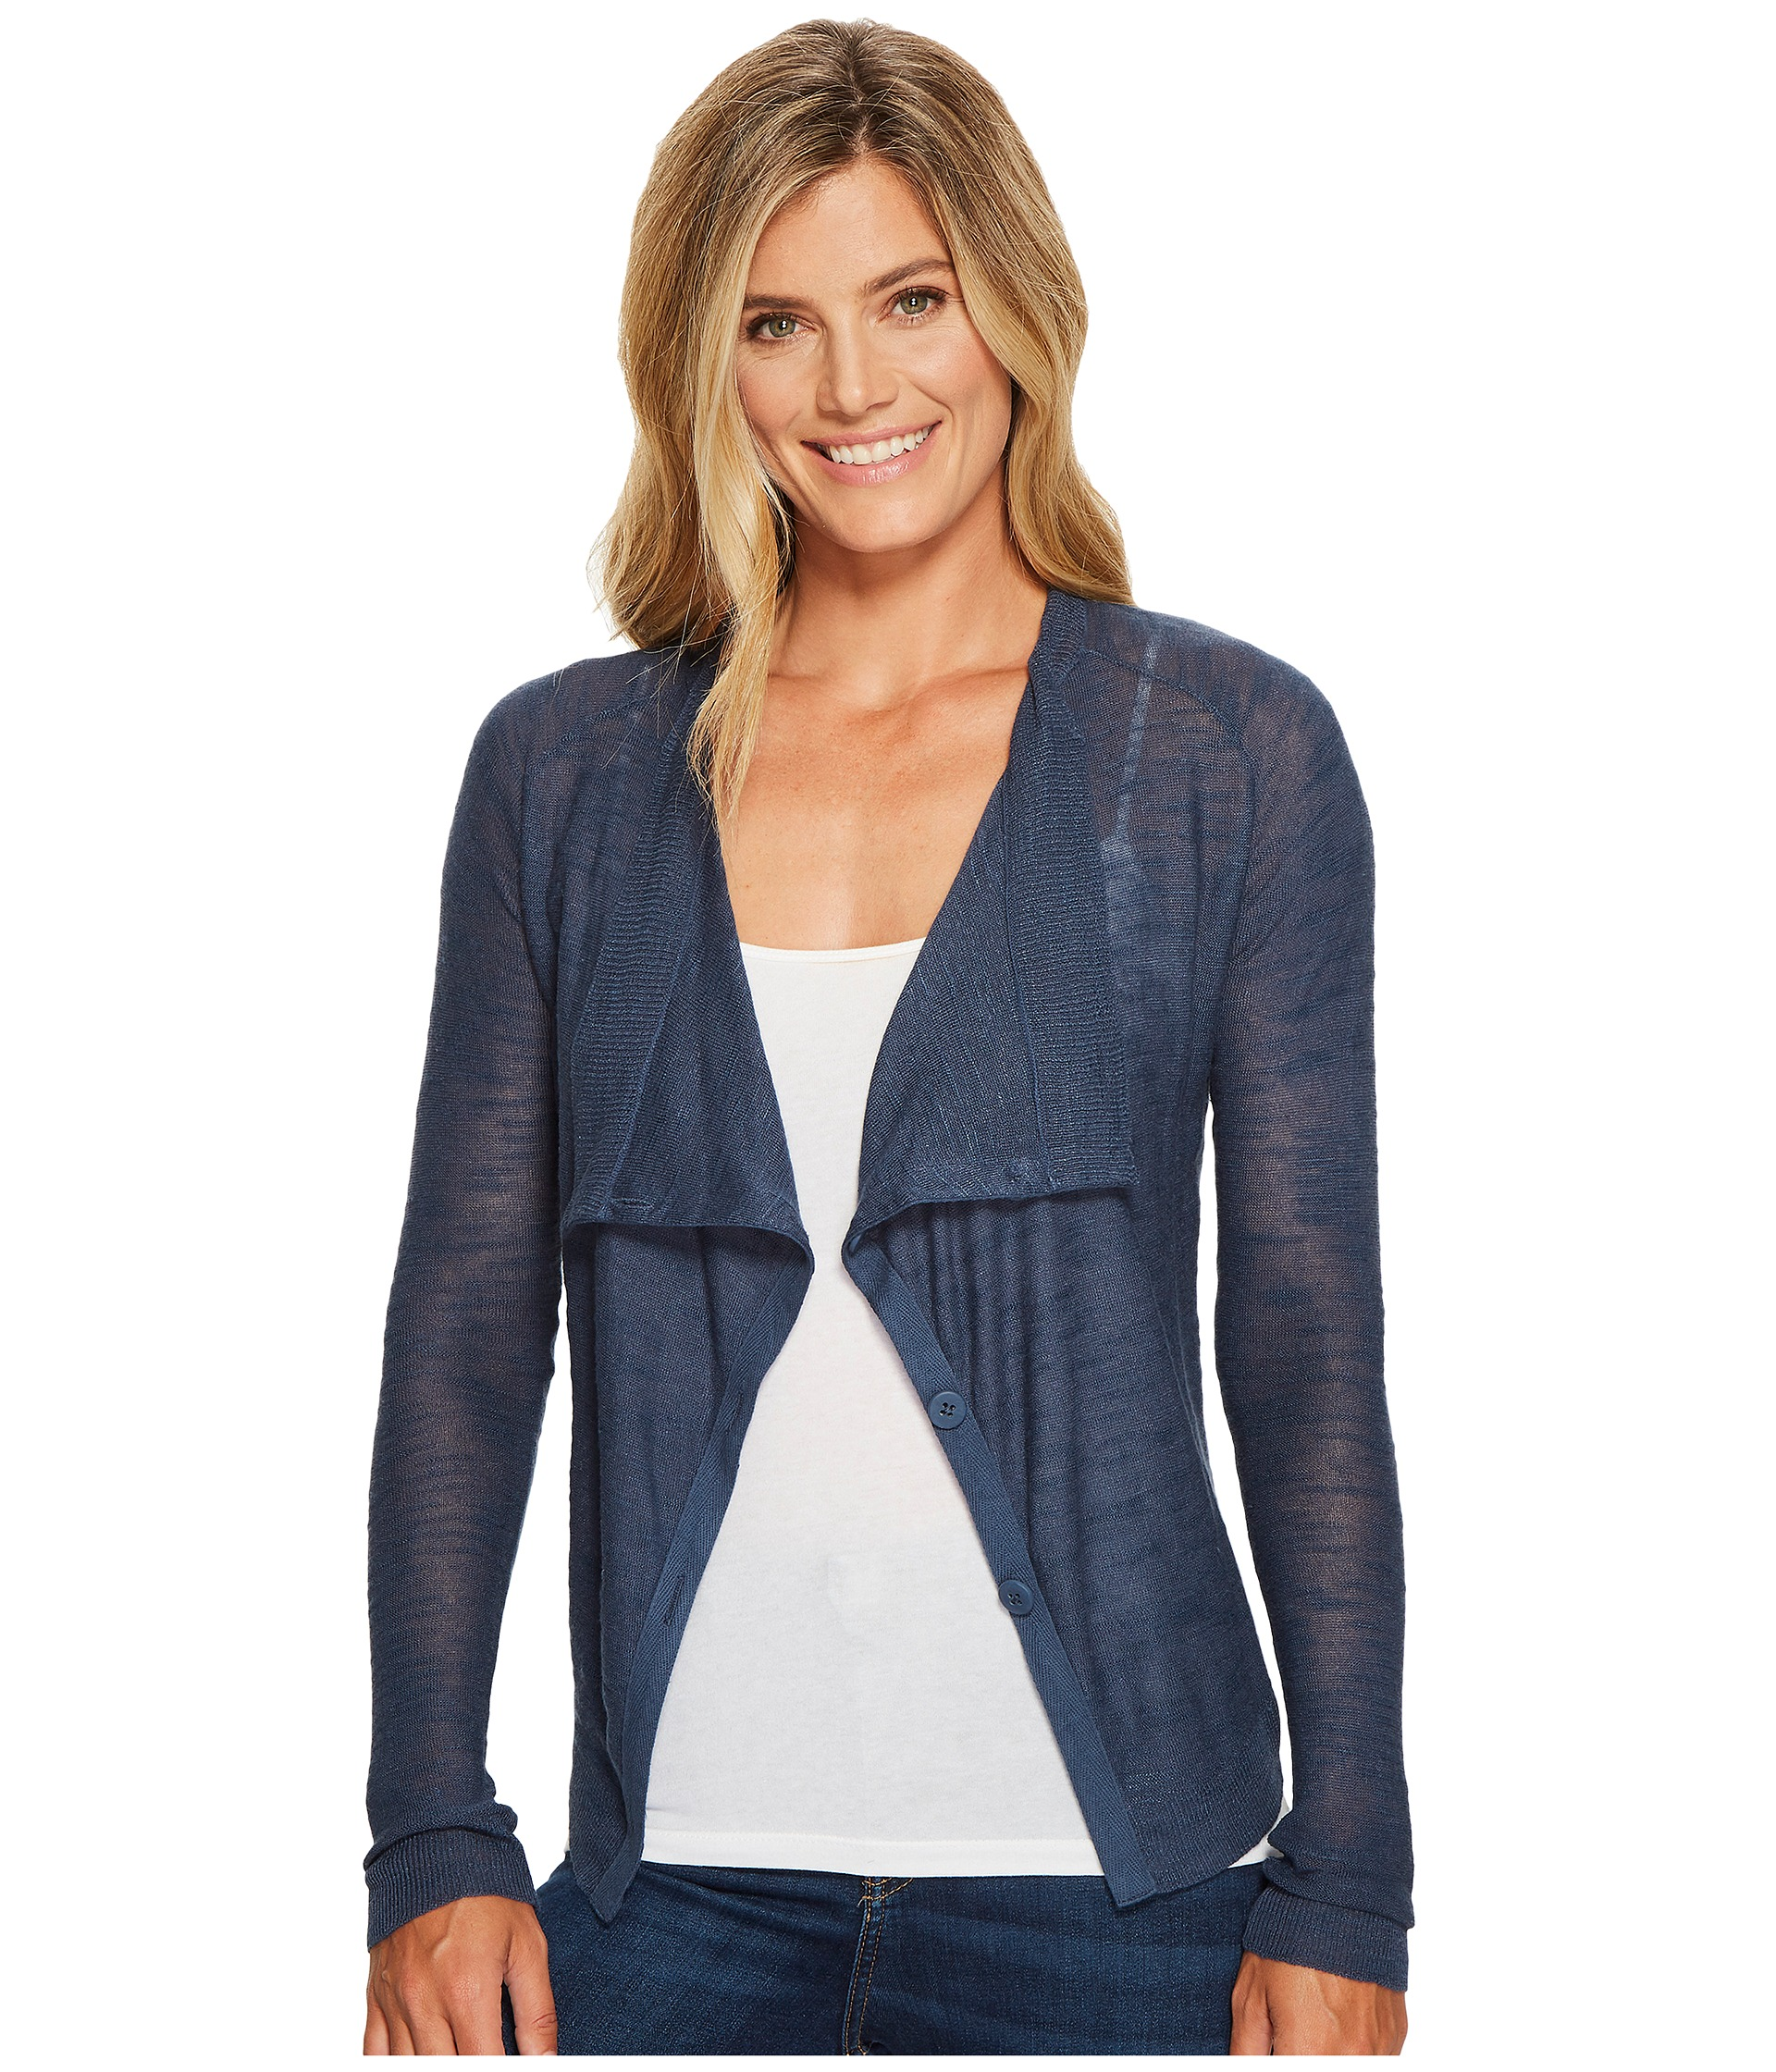 Lucky Brand Linen Drape Cardigan Sweater At Zappos.com